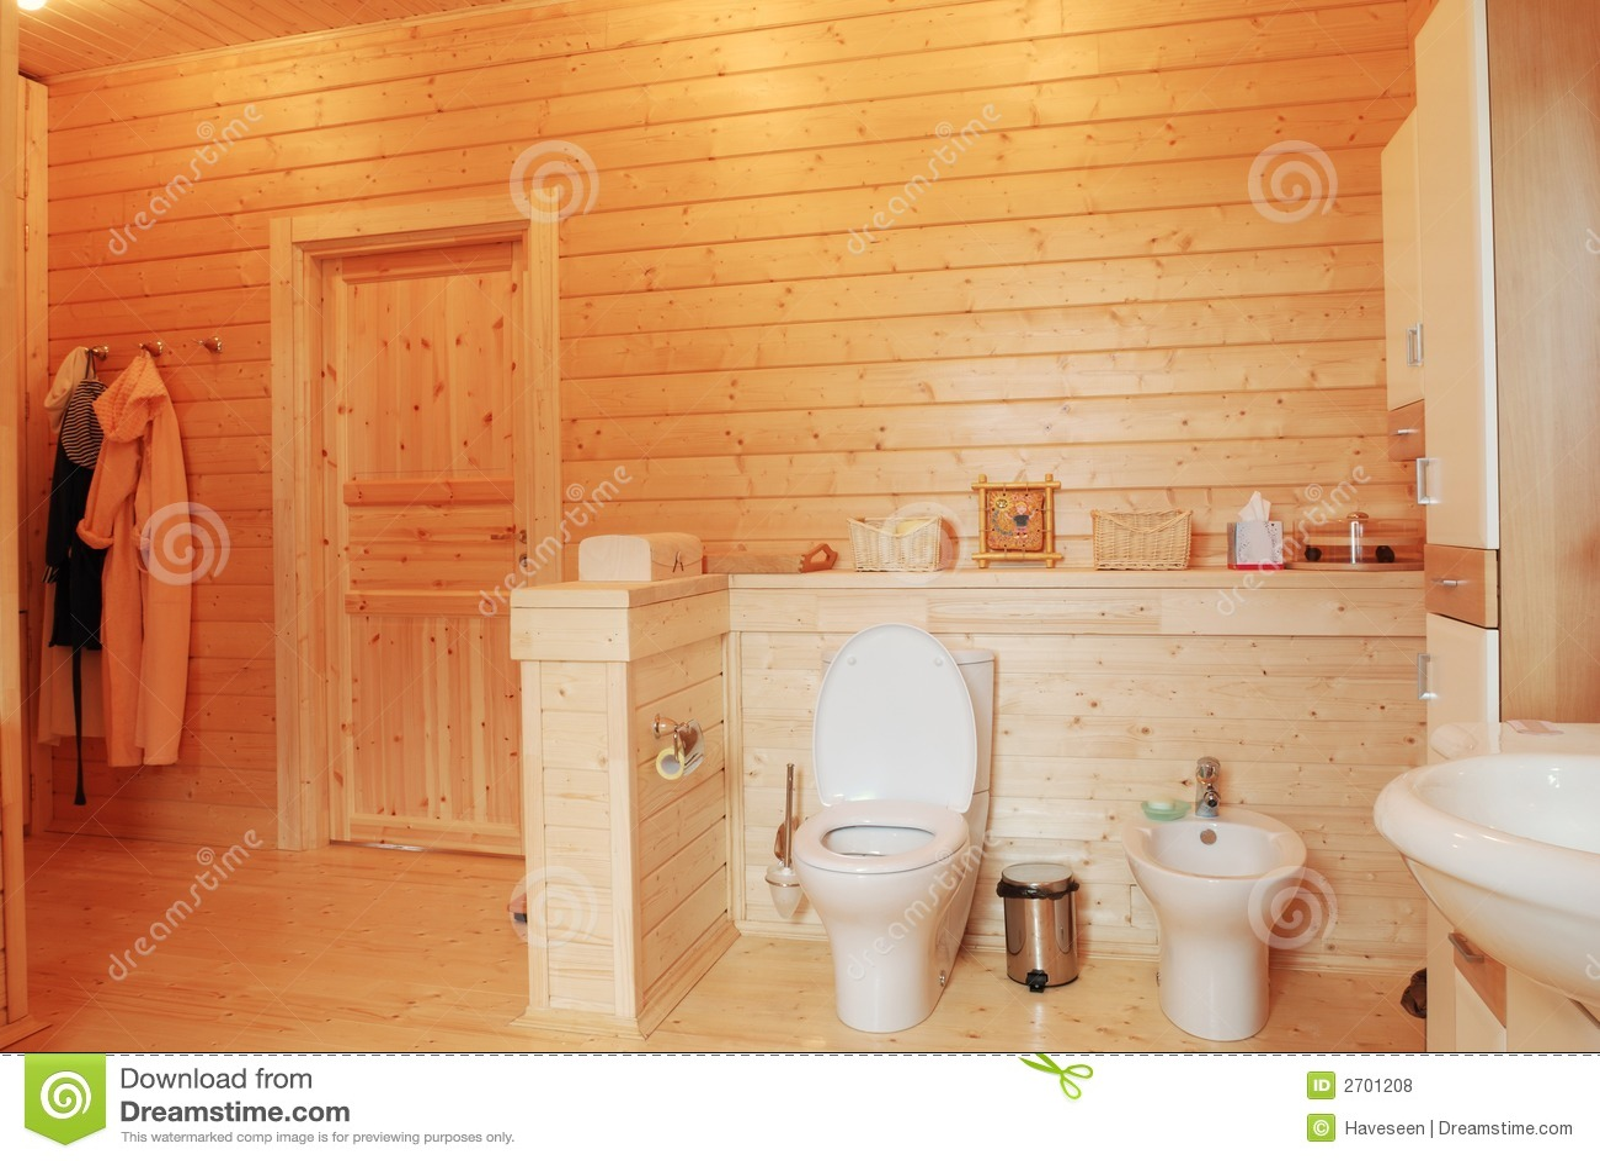 houten badkamers